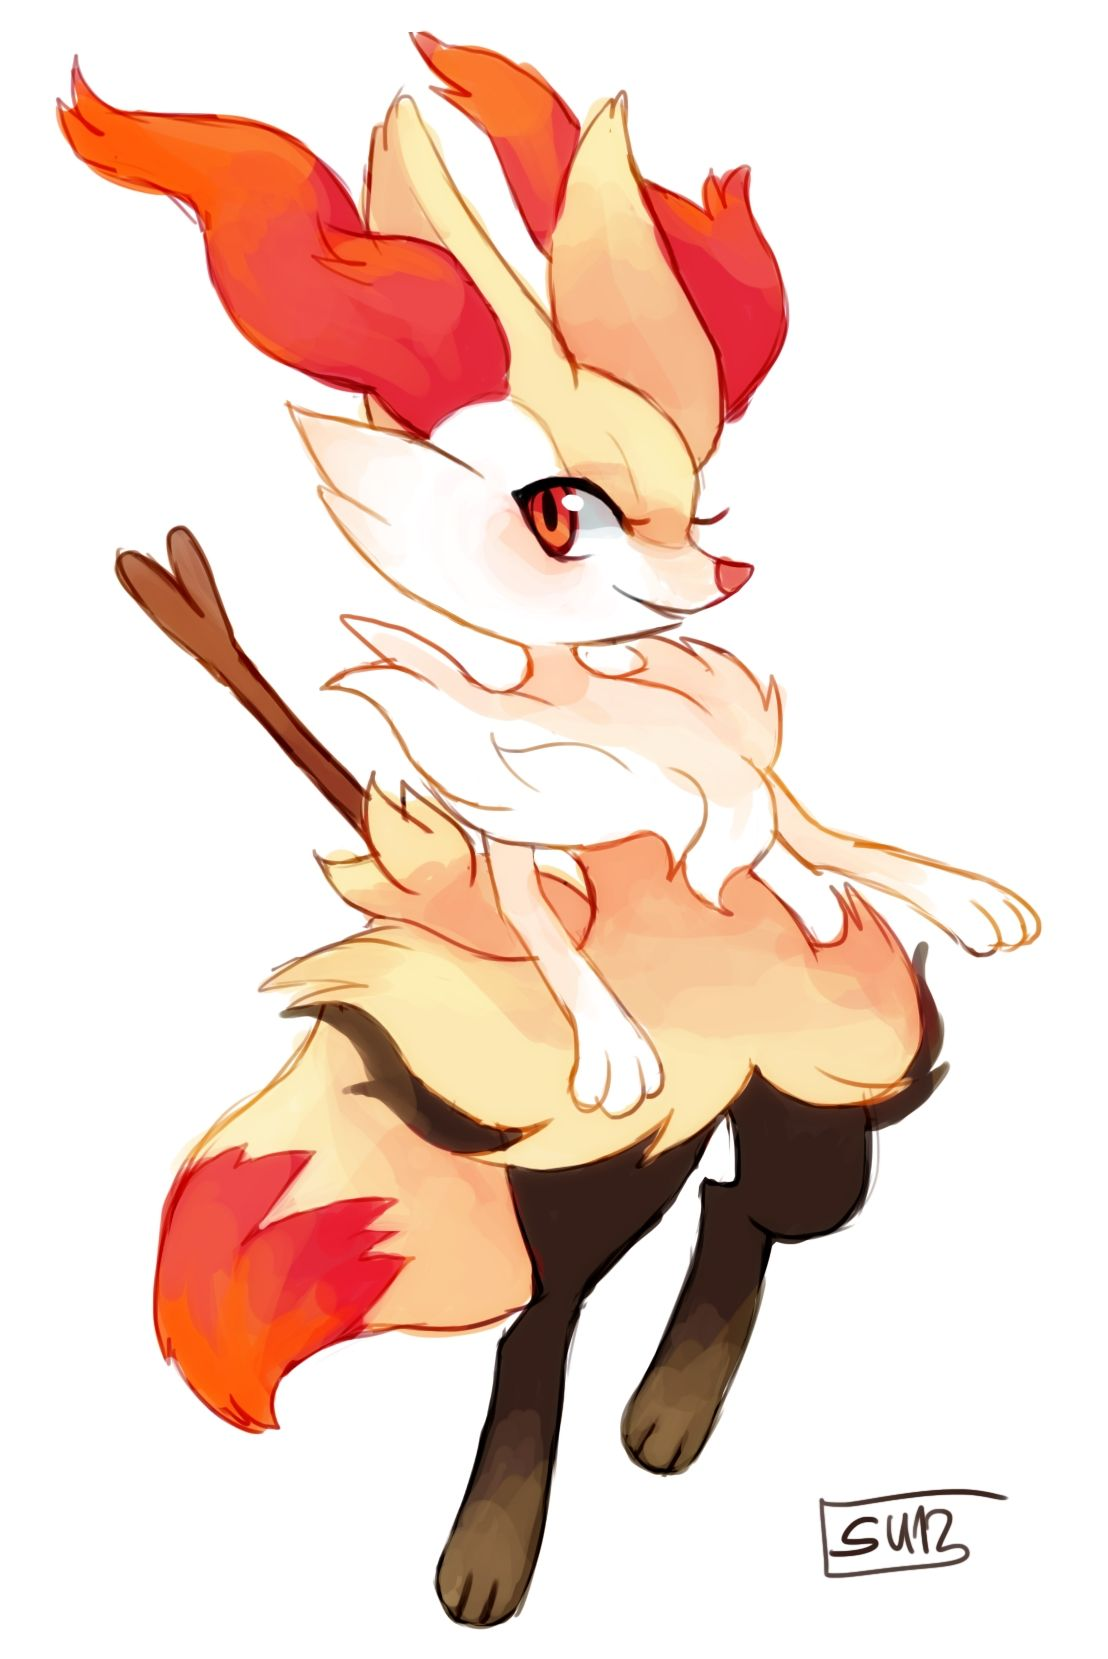 Haircut styles in pokemon sun and moon braixen  pokemon  pinterest  pokémon anime and video games